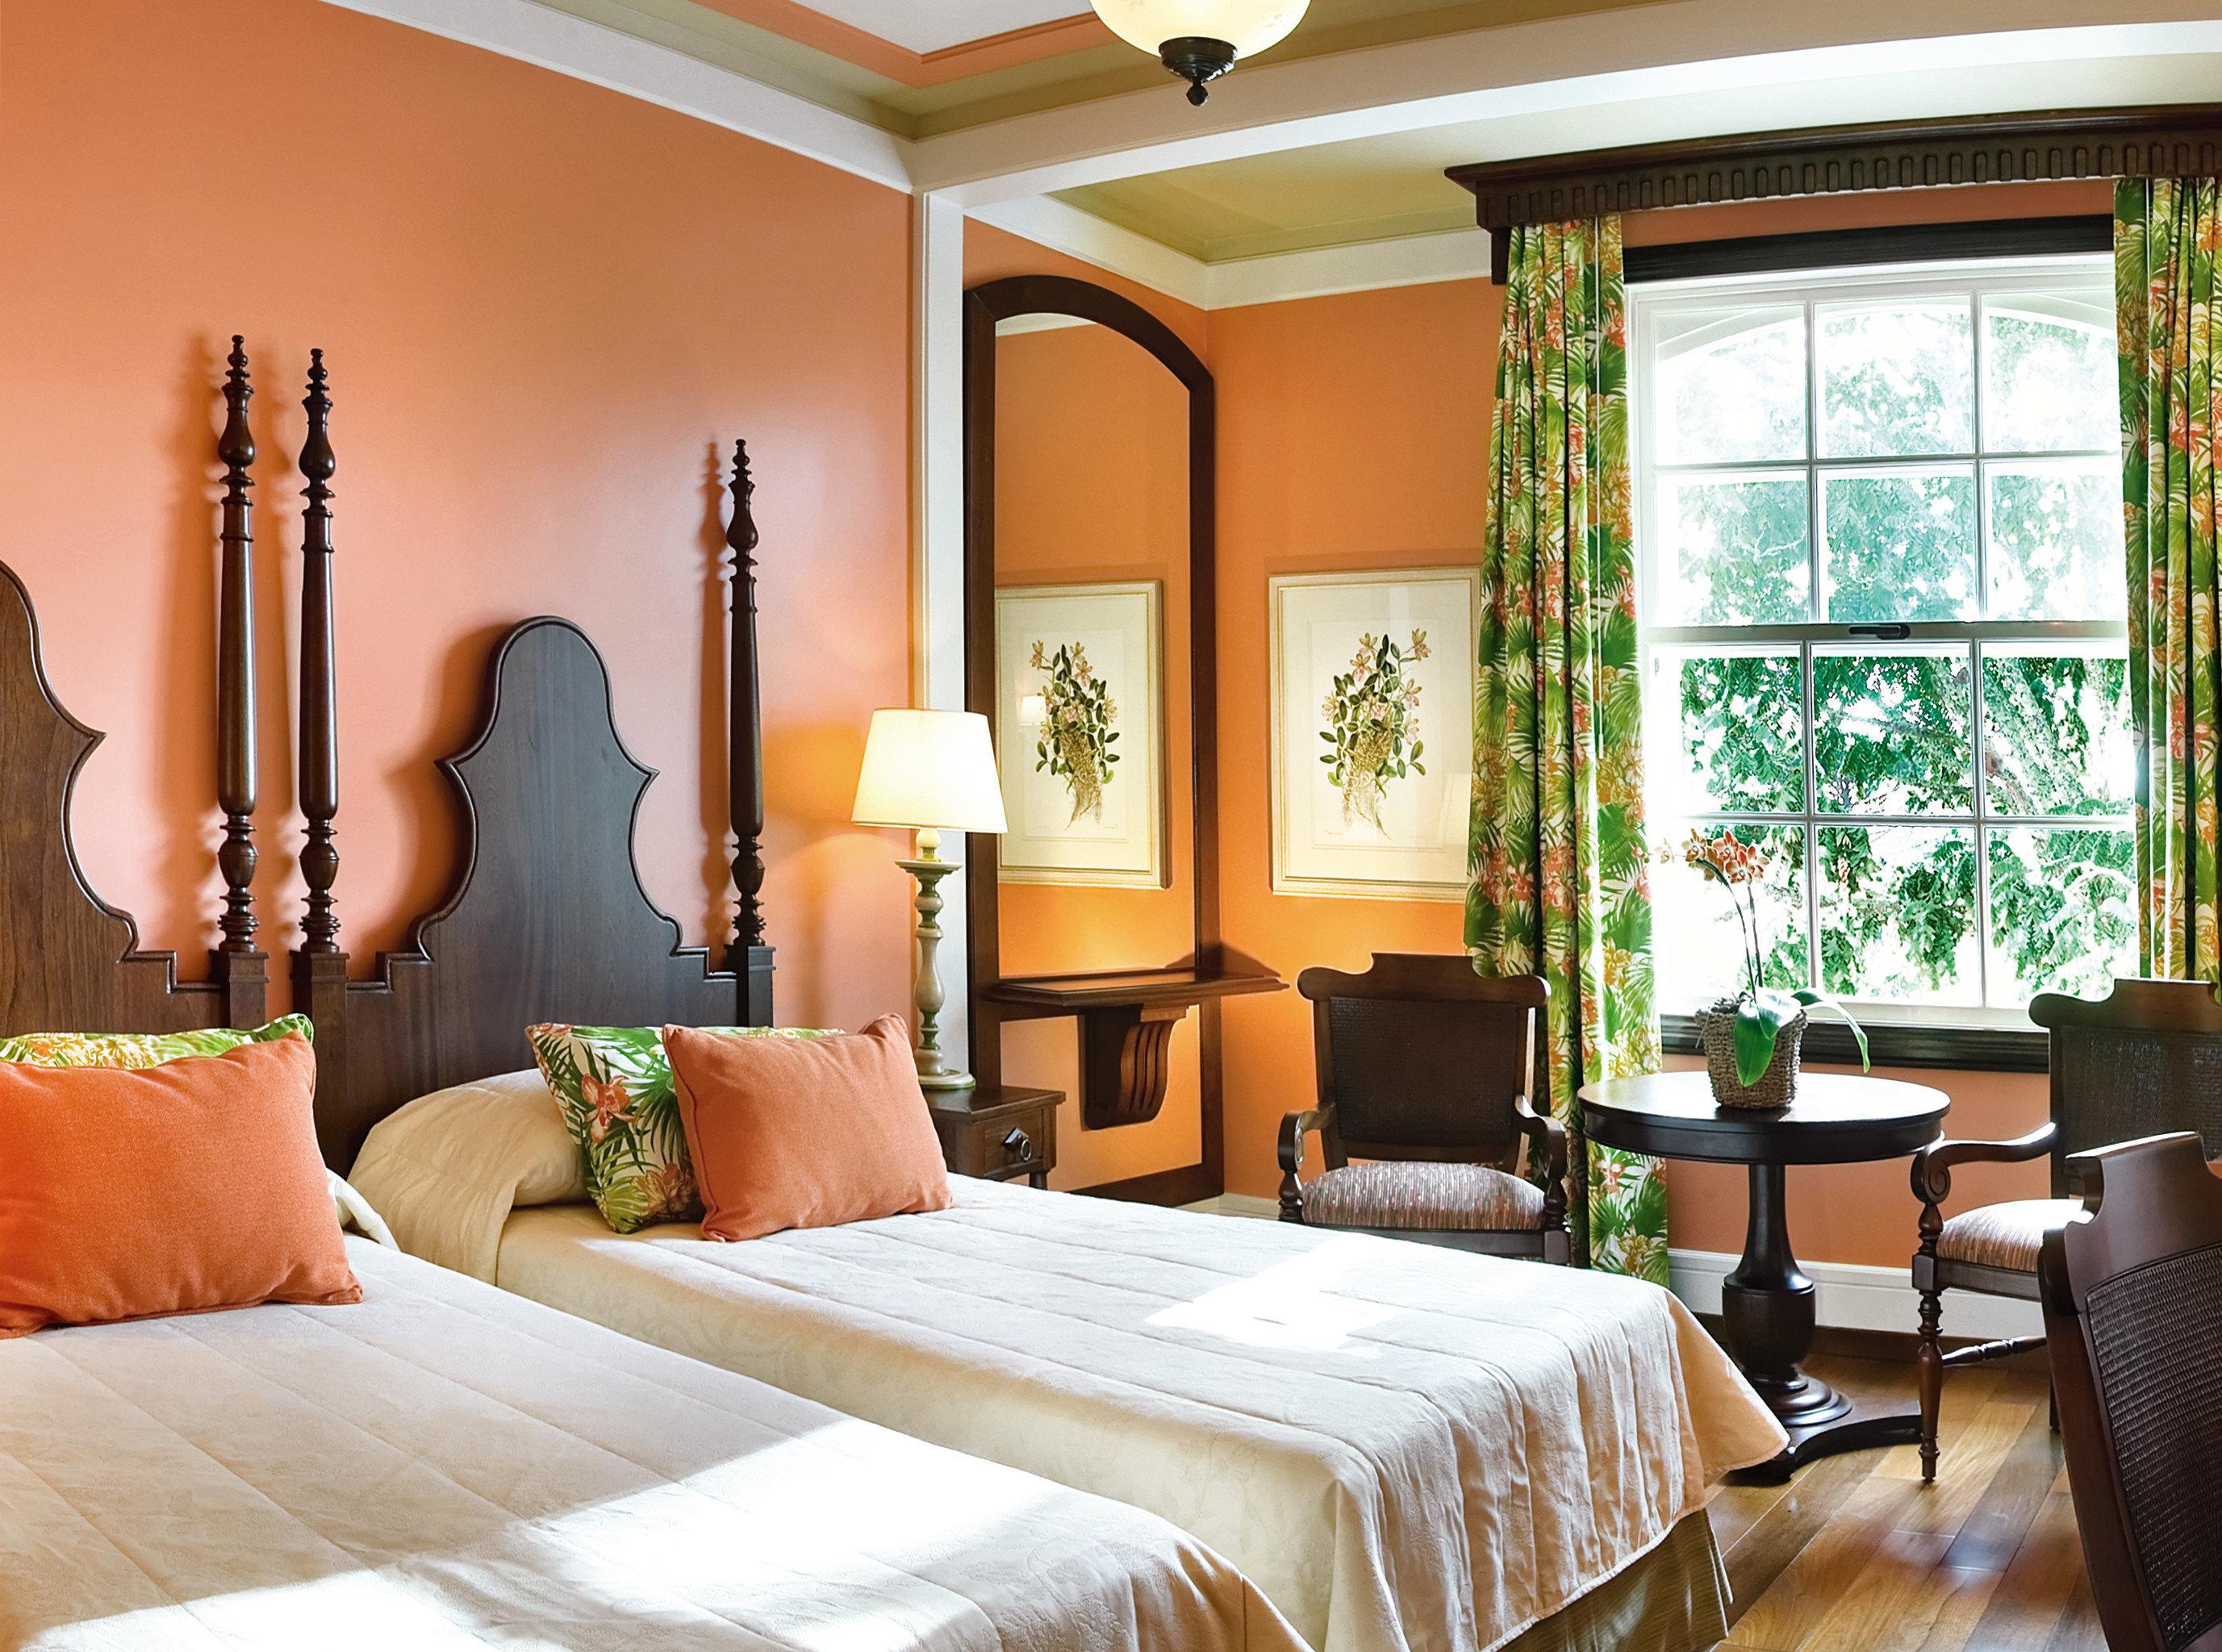 Beach Bedroom Classic Hotels Resort property living room home Suite condominium cottage